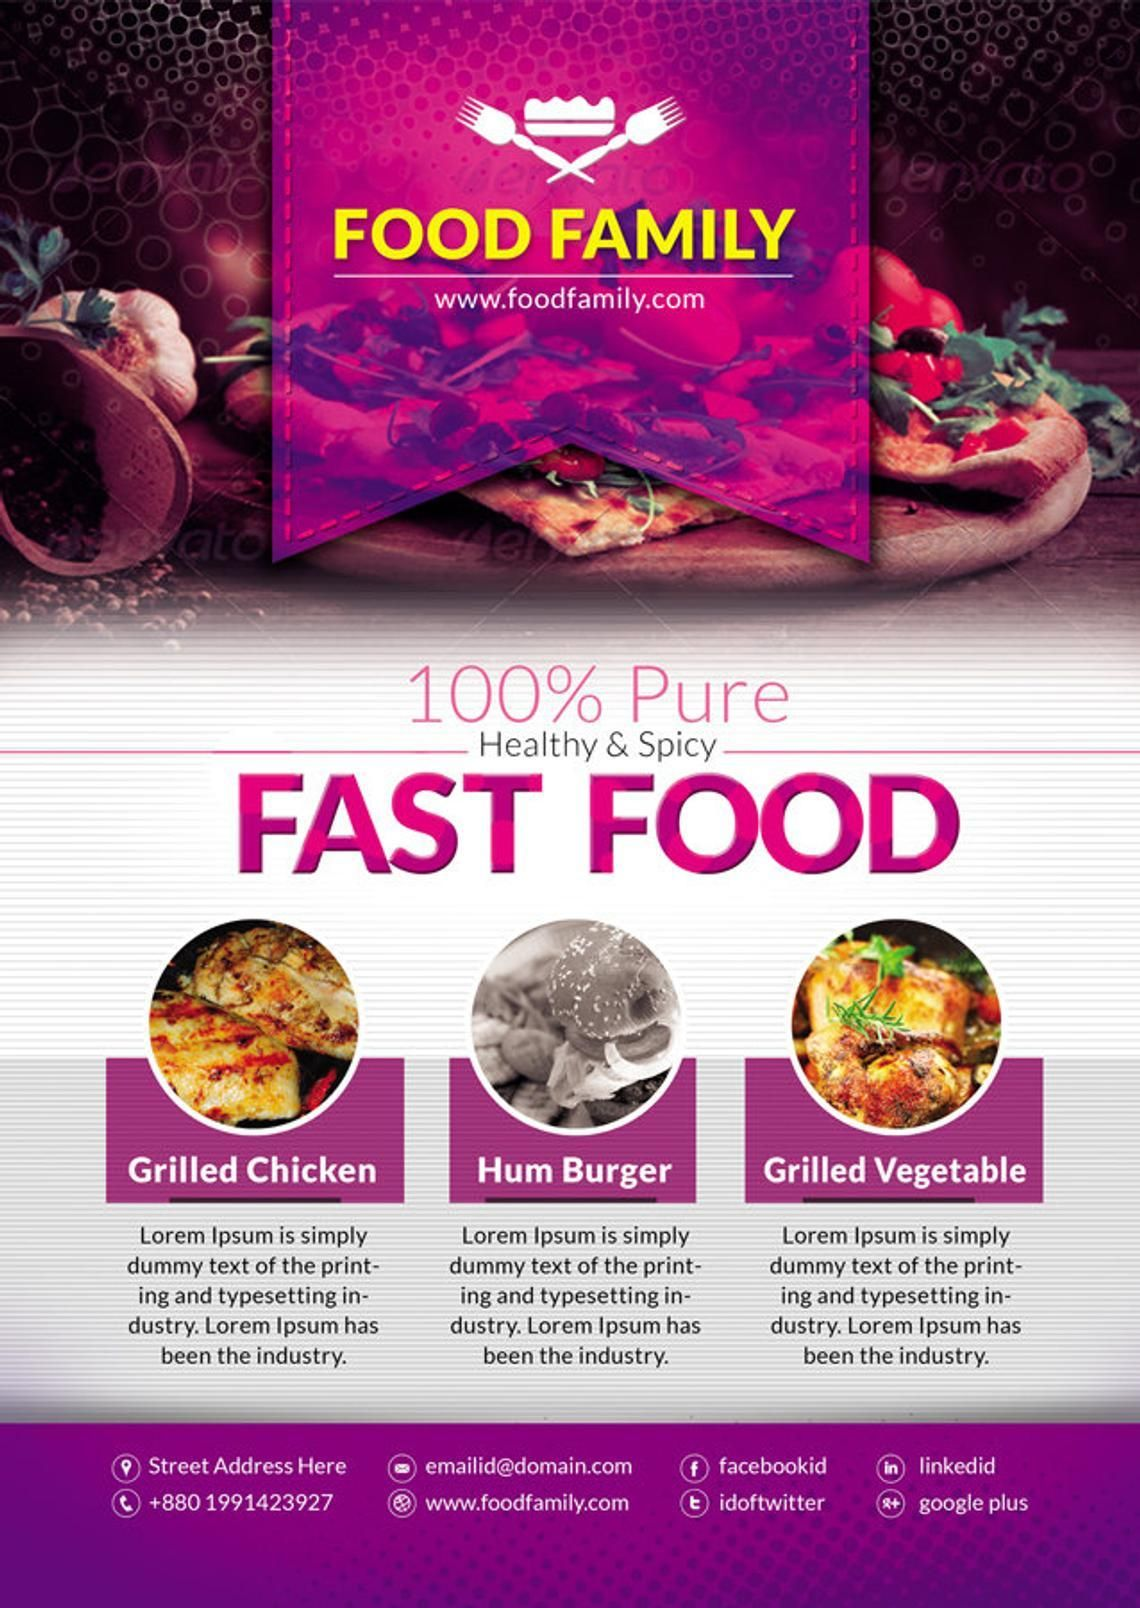 Food Family - Fast Food Restaurant Flyer and Poster Design Template, Slide 5, 08839, Food & Beverage — PoweredTemplate.com